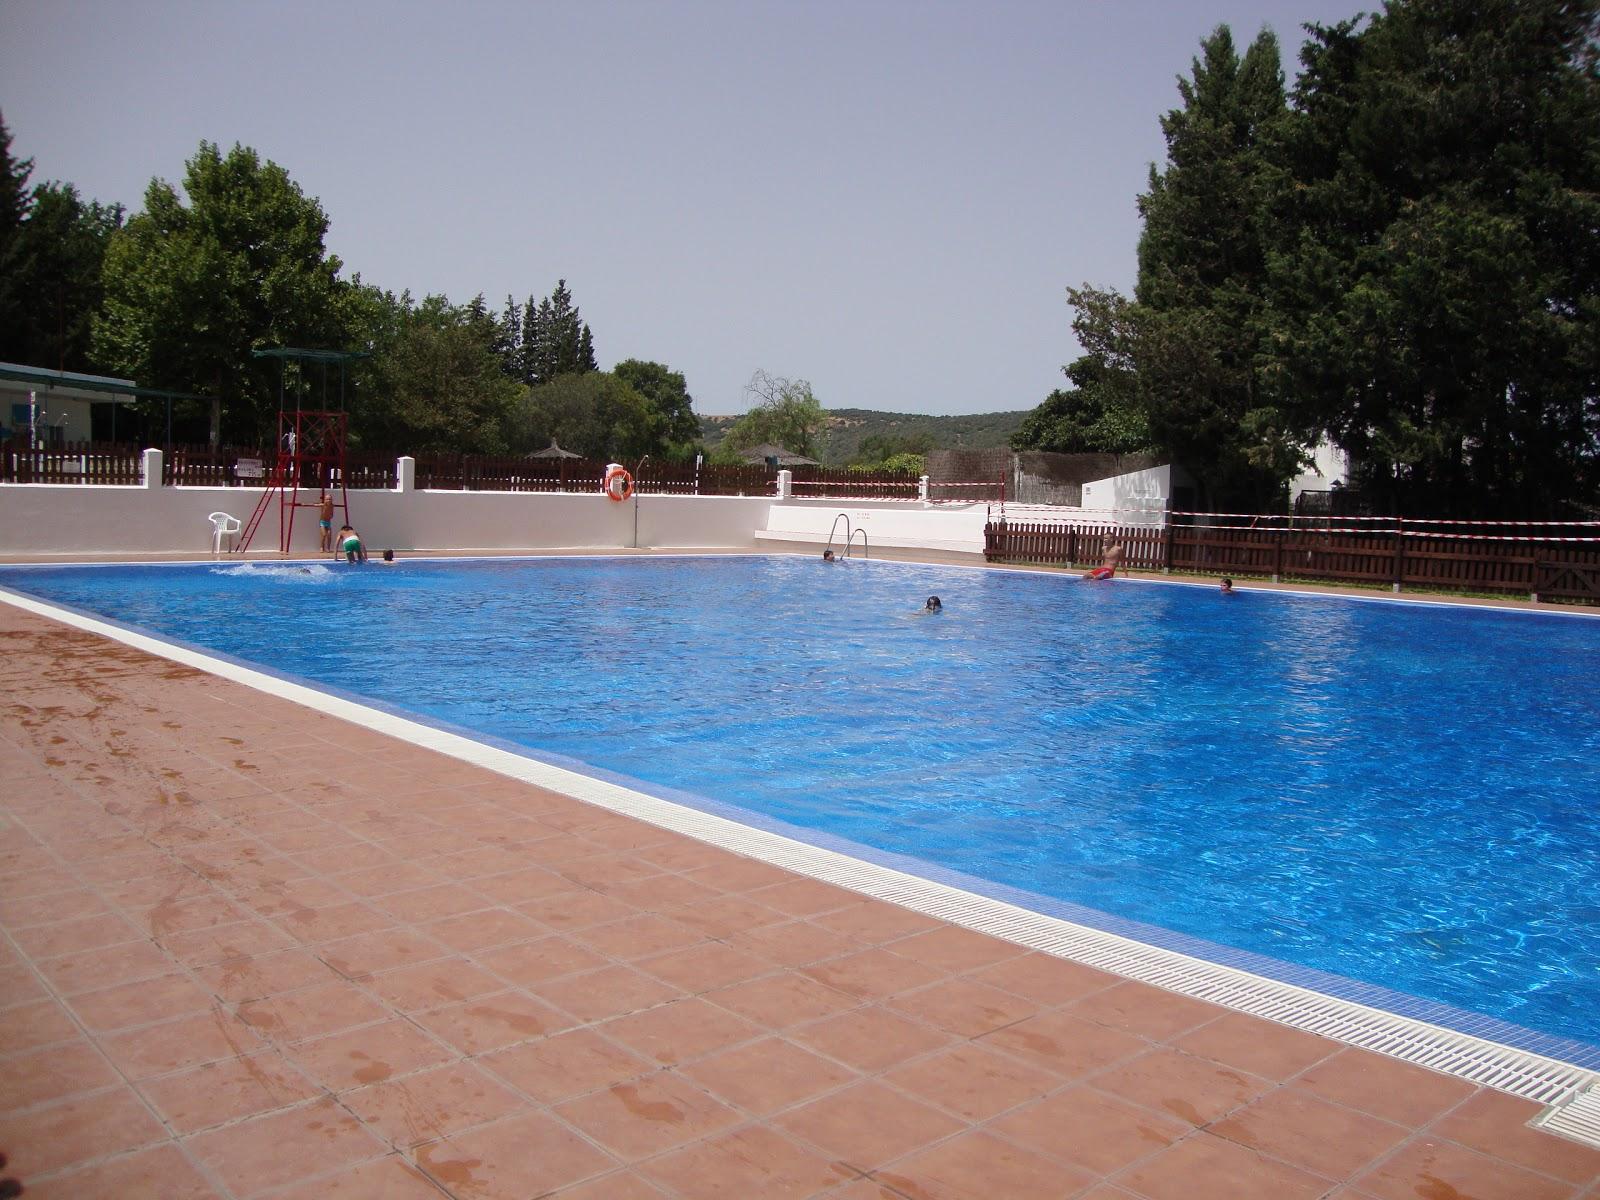 La vida alcala na la piscina municipal for Piscina municipal mataro